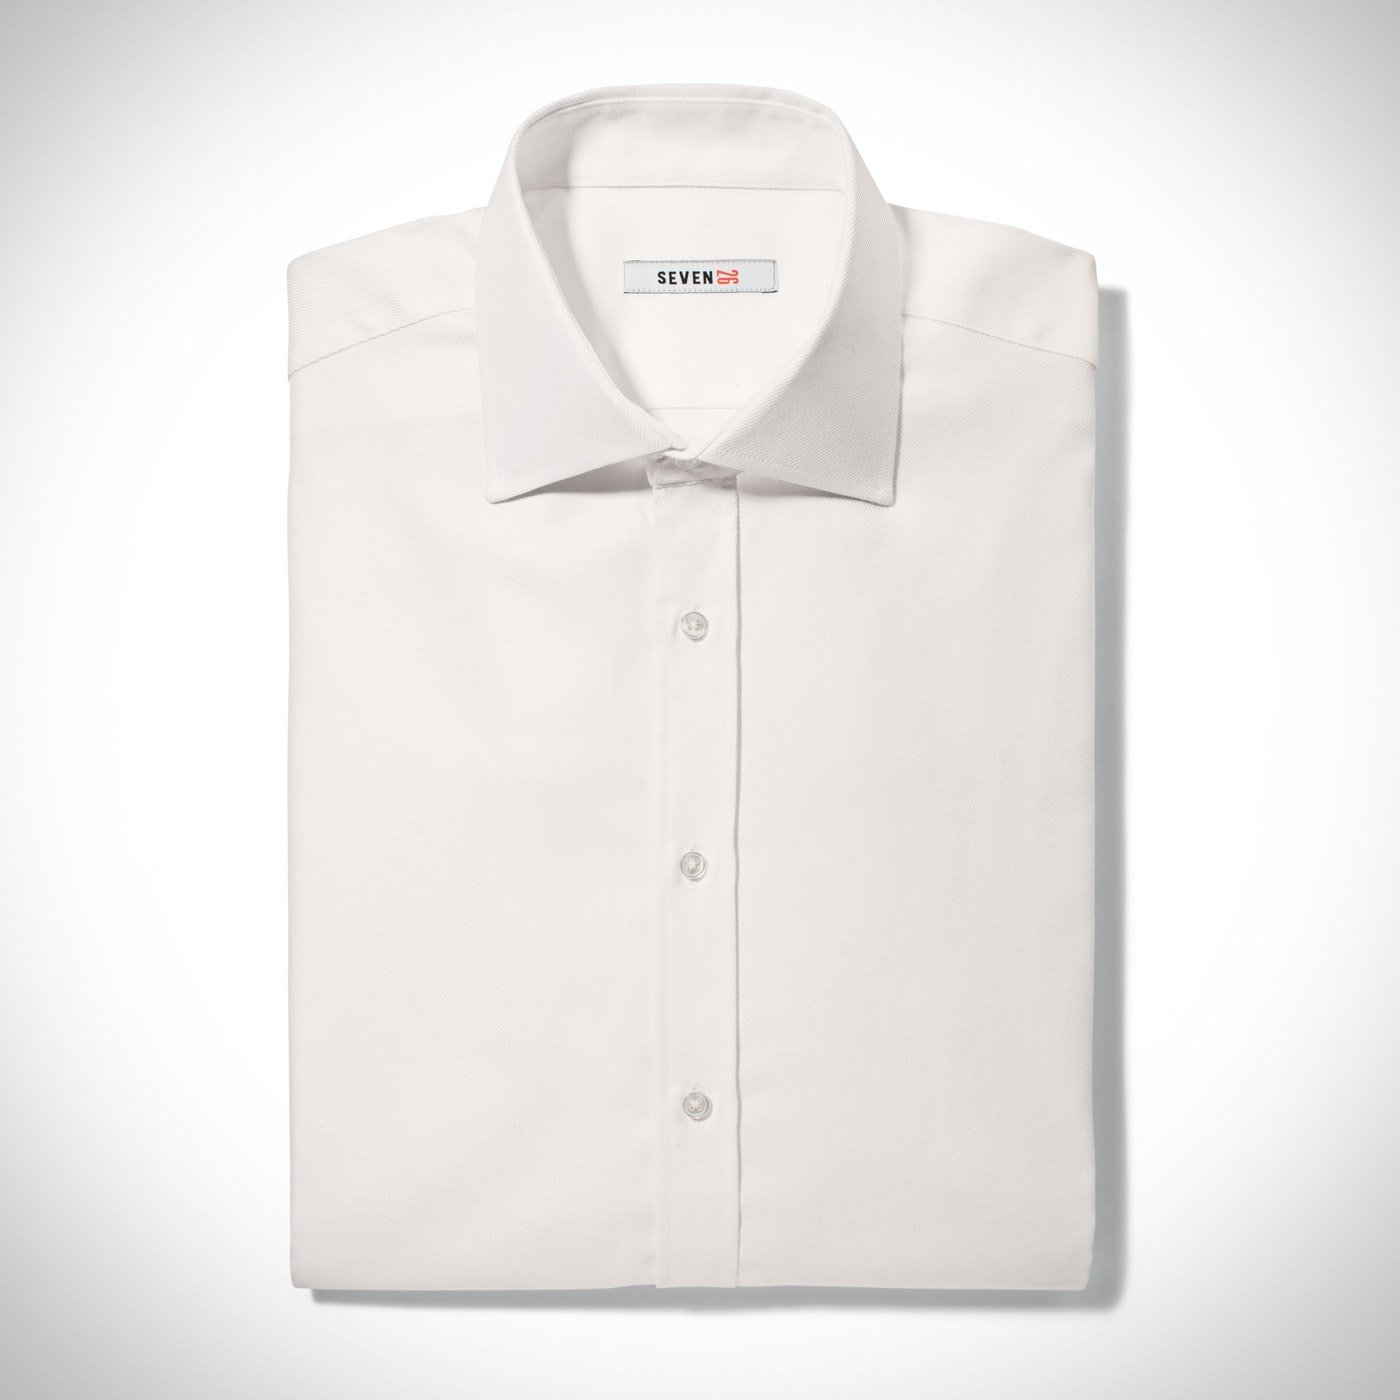 Ivory Twill Spread Collar Shirt